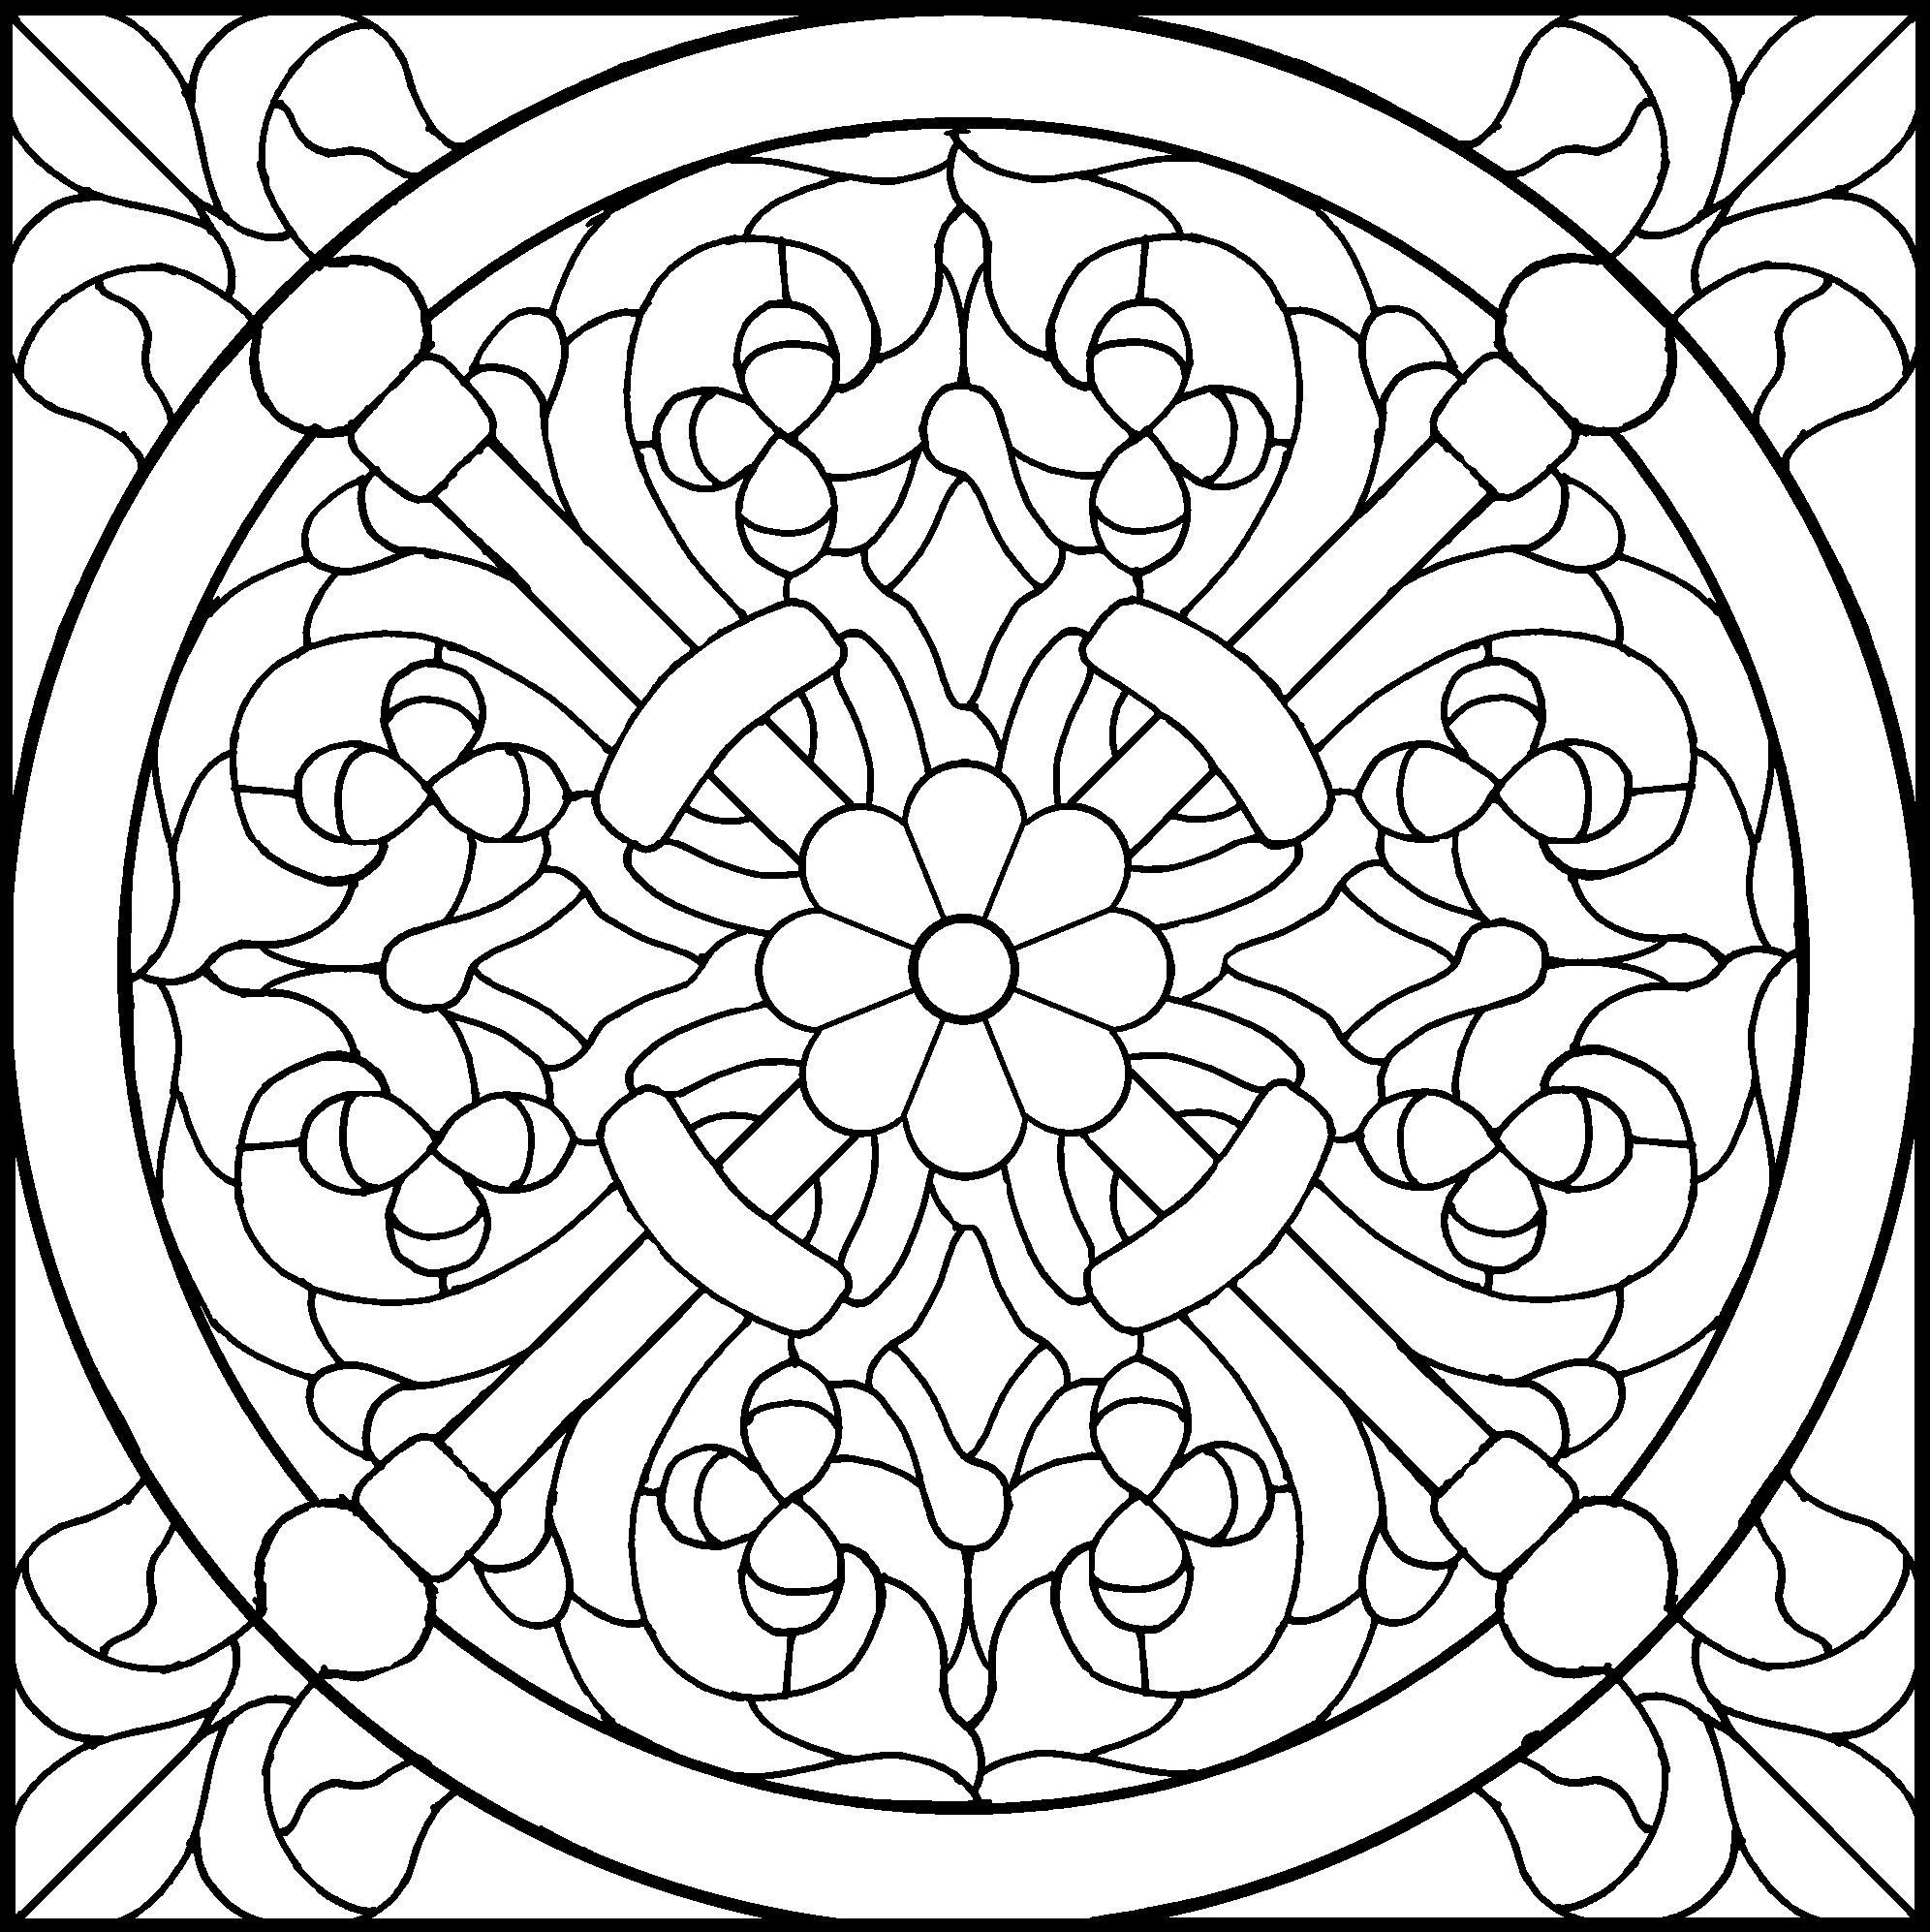 Printable coloring page fleur de lis mandala mandalas for Fleur de lis coloring page